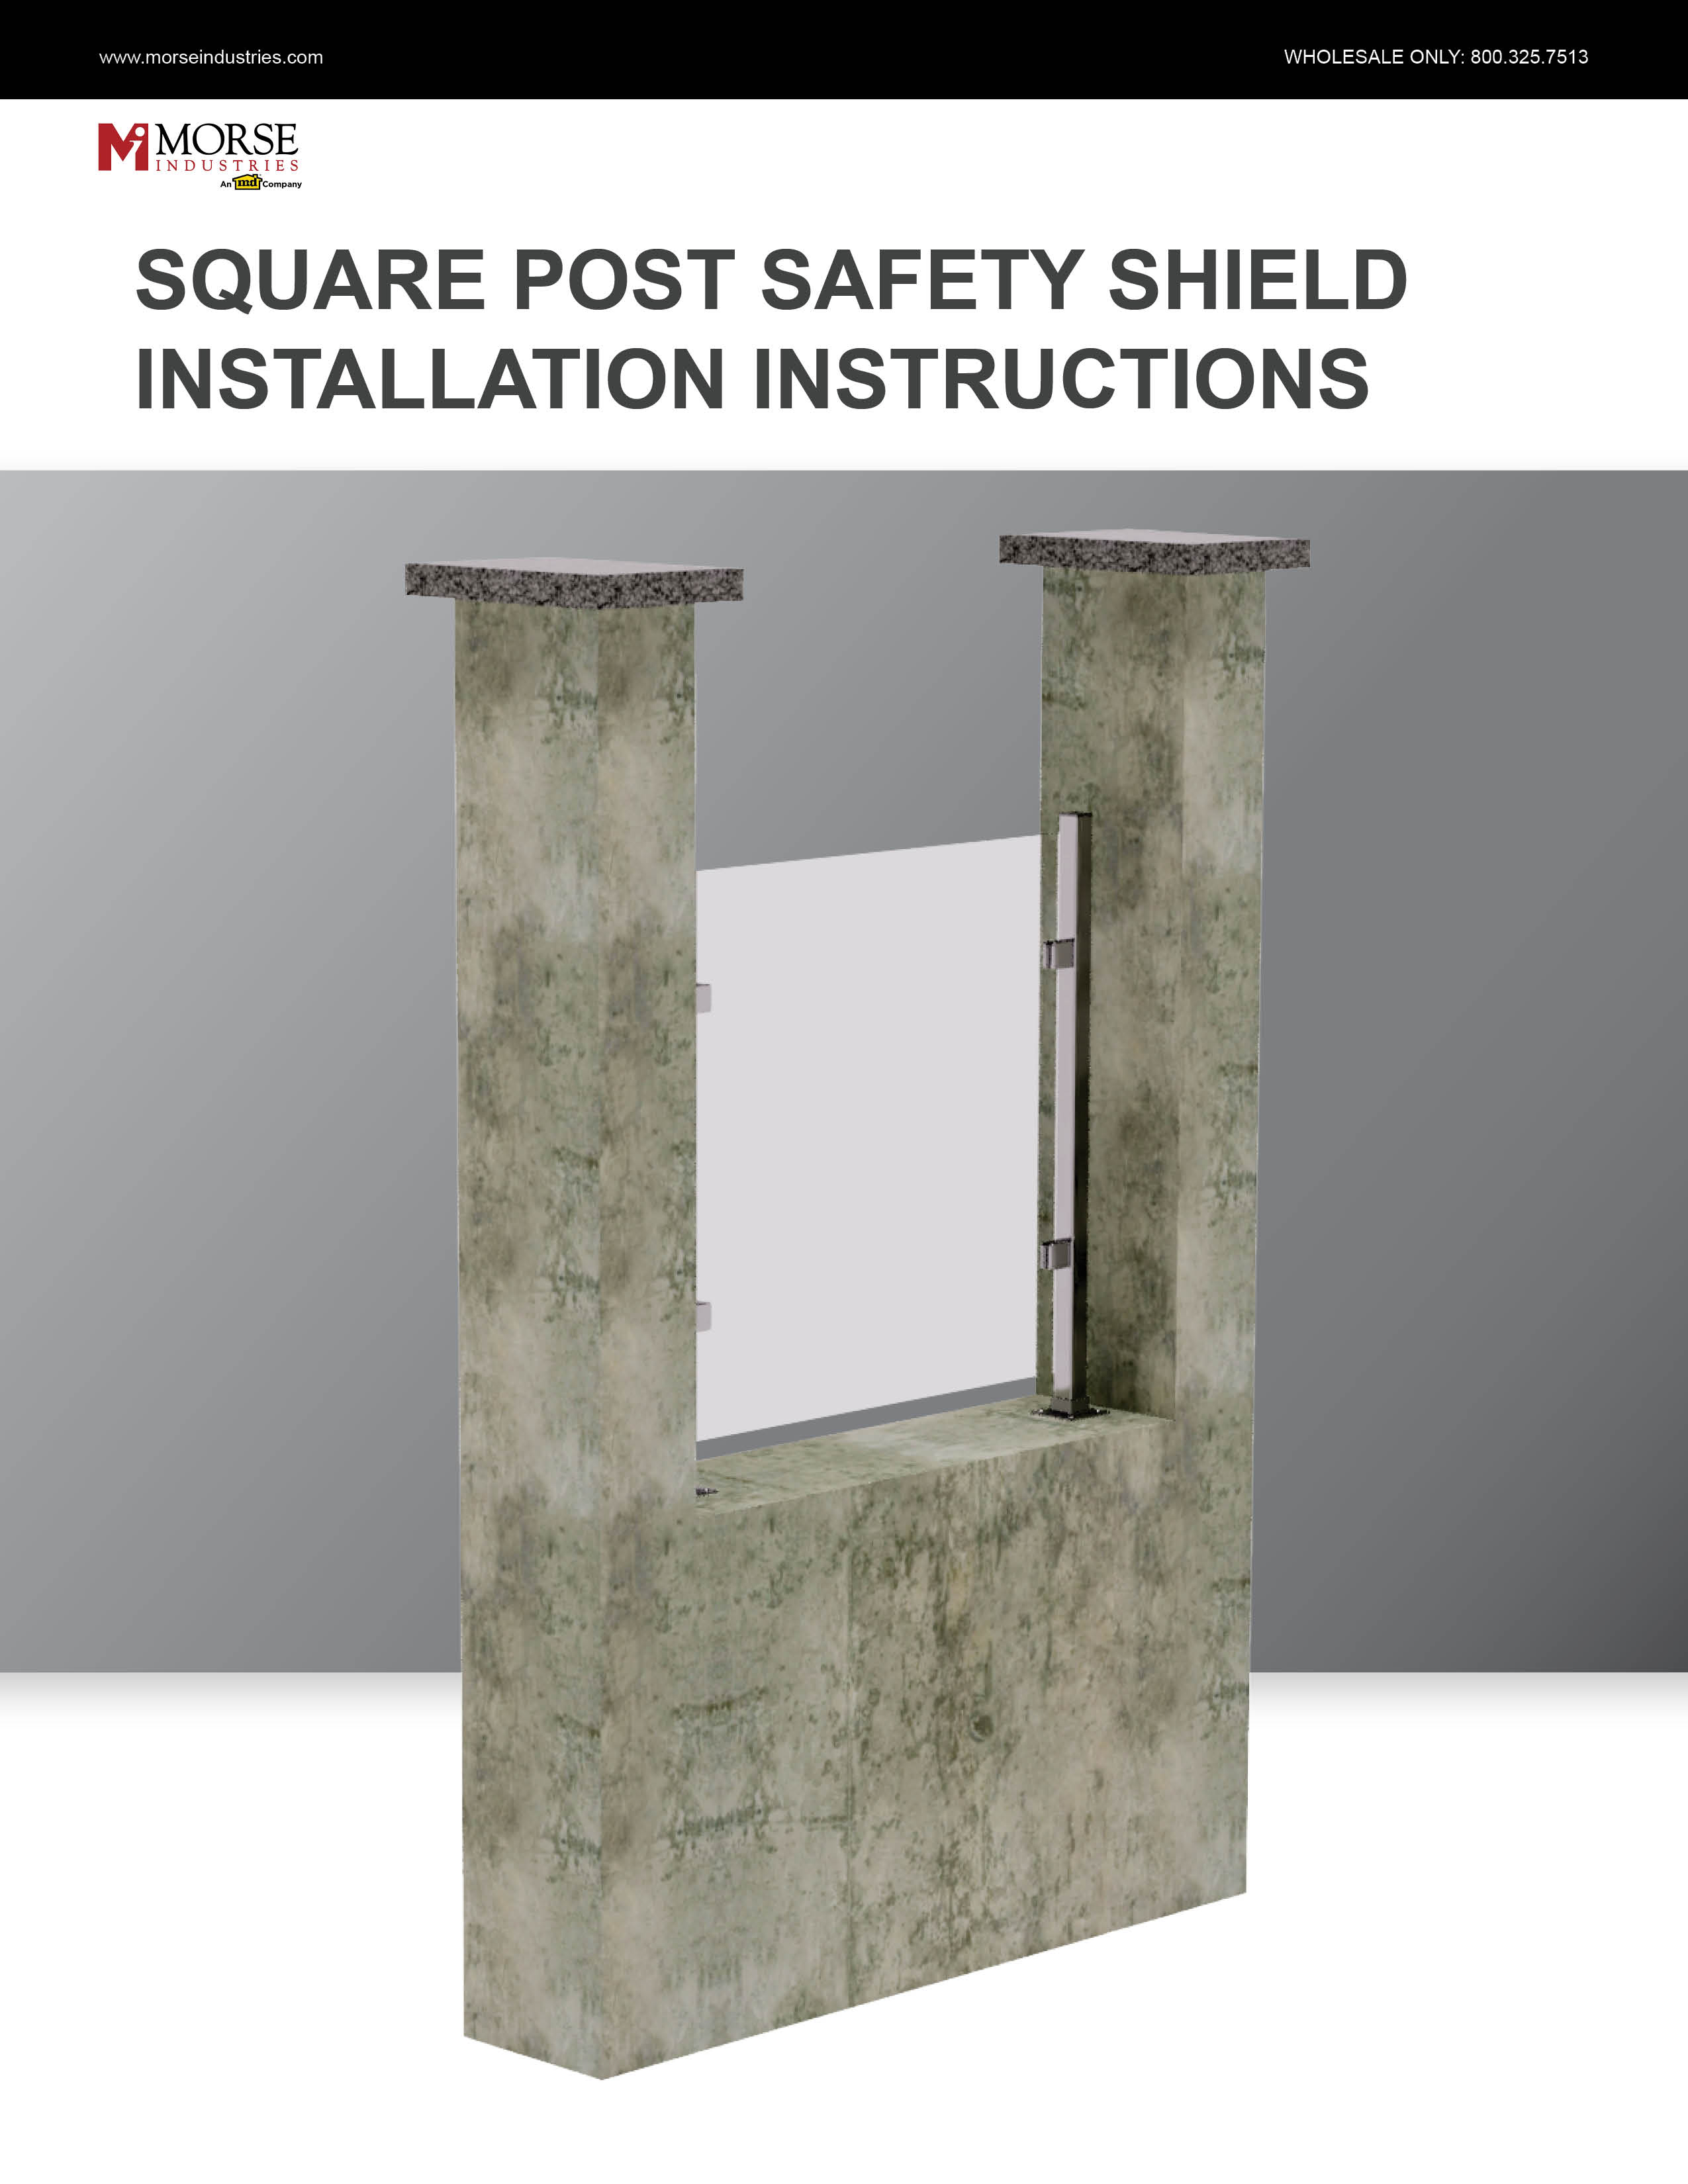 Square Post Shield Installation Instructions